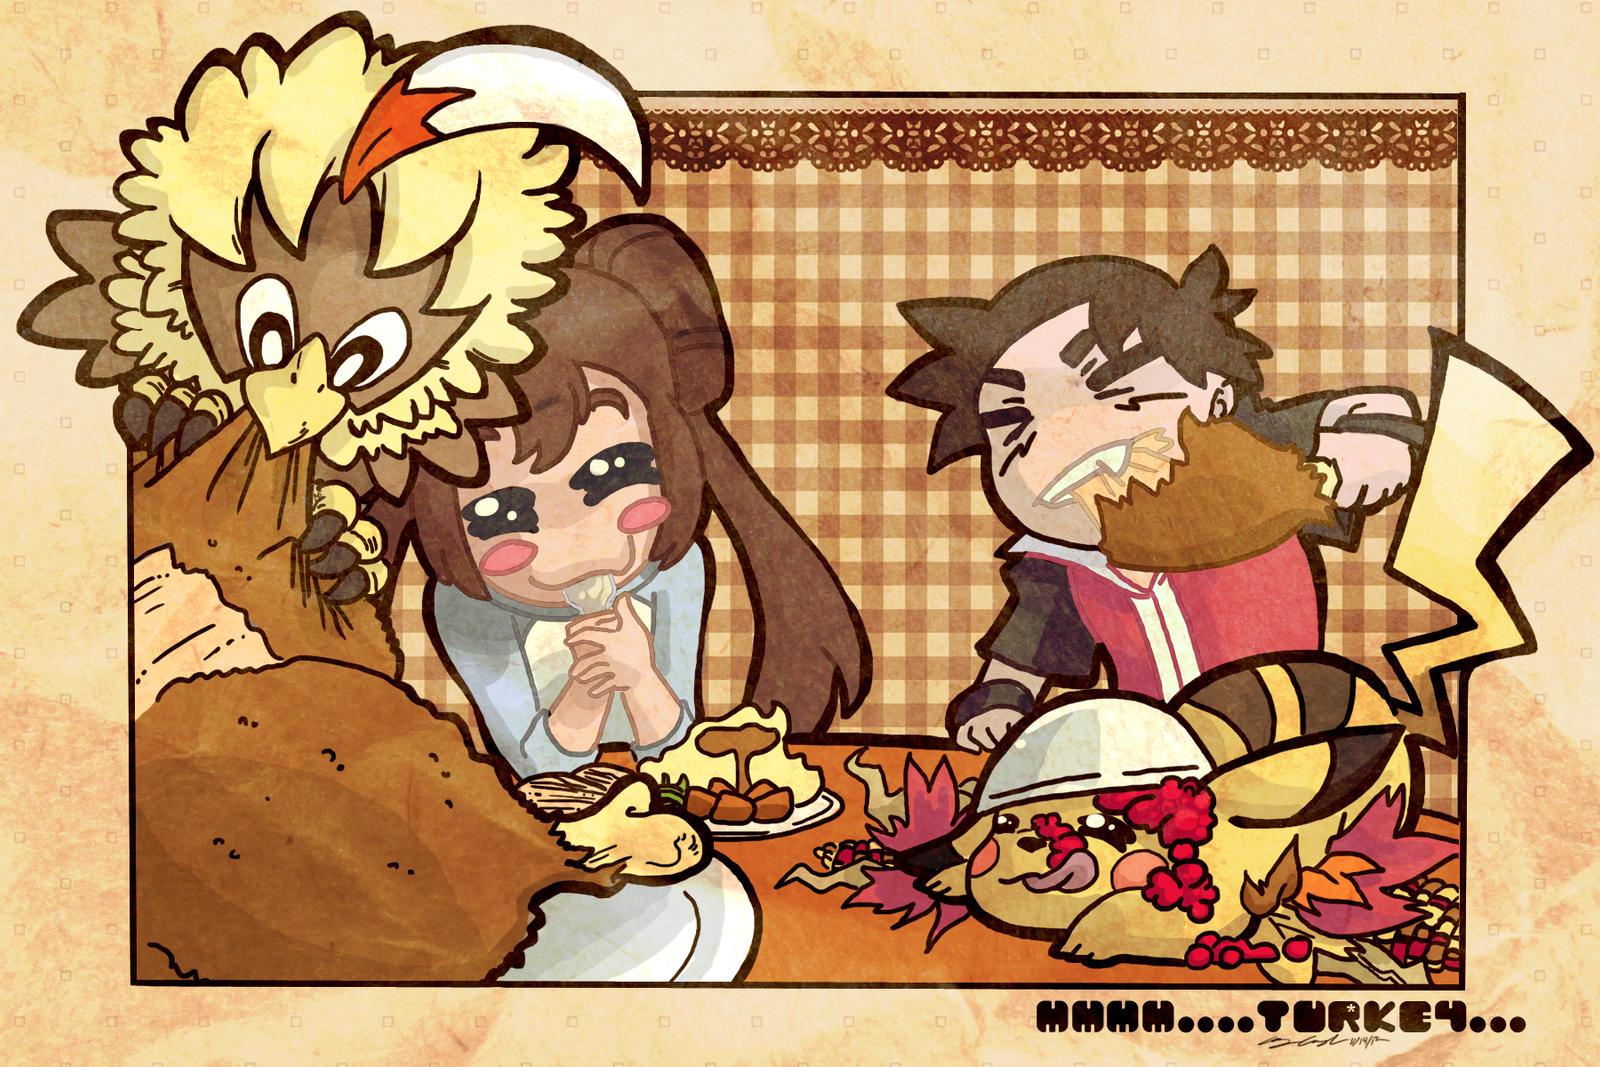 Mmm...Turkey...